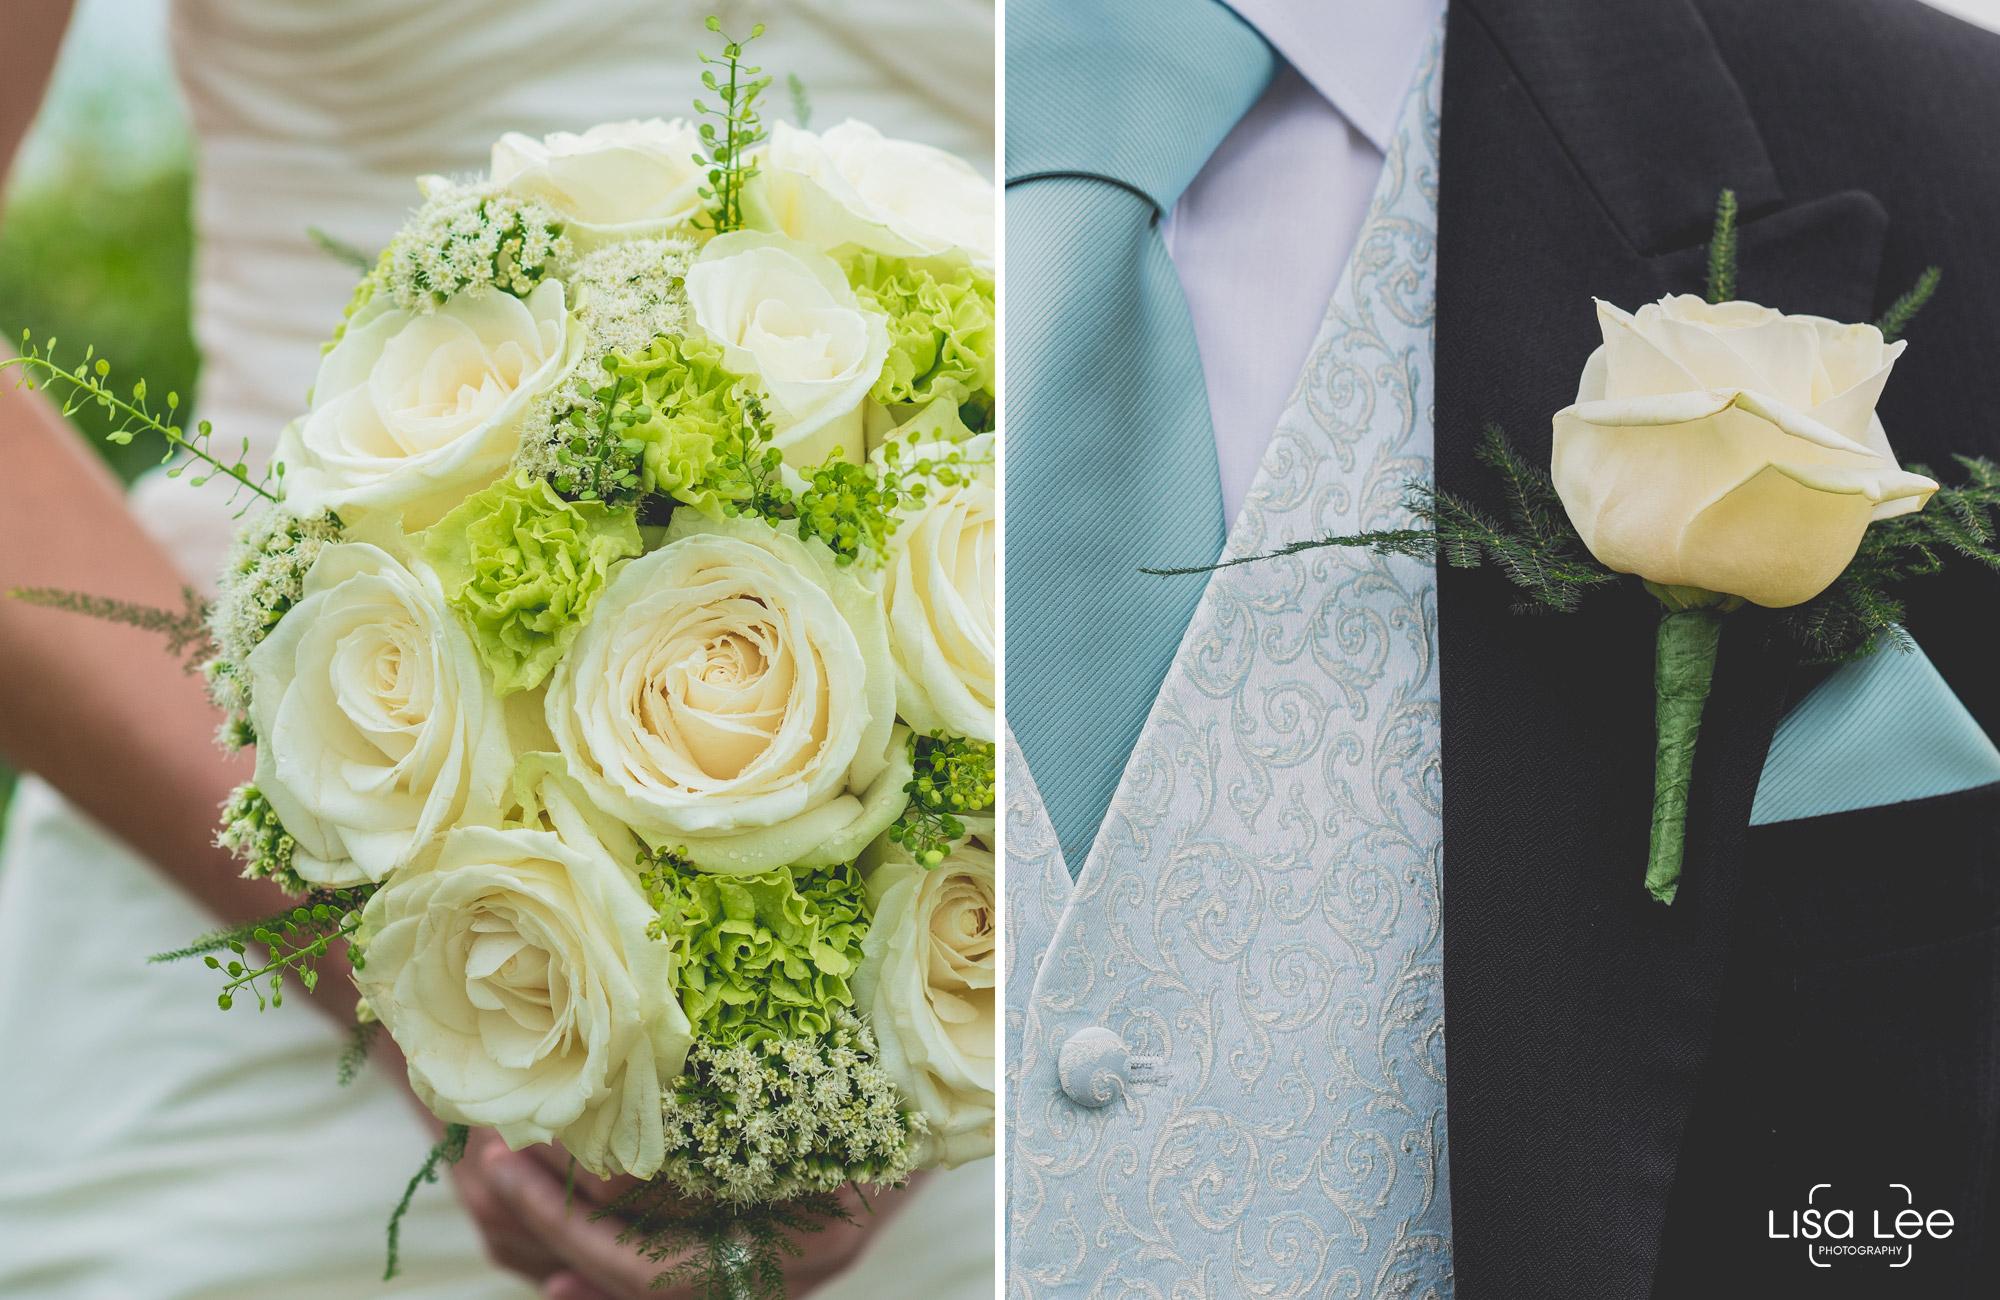 lisa-lee-wedding-photography-burton-flowerscrop.jpg